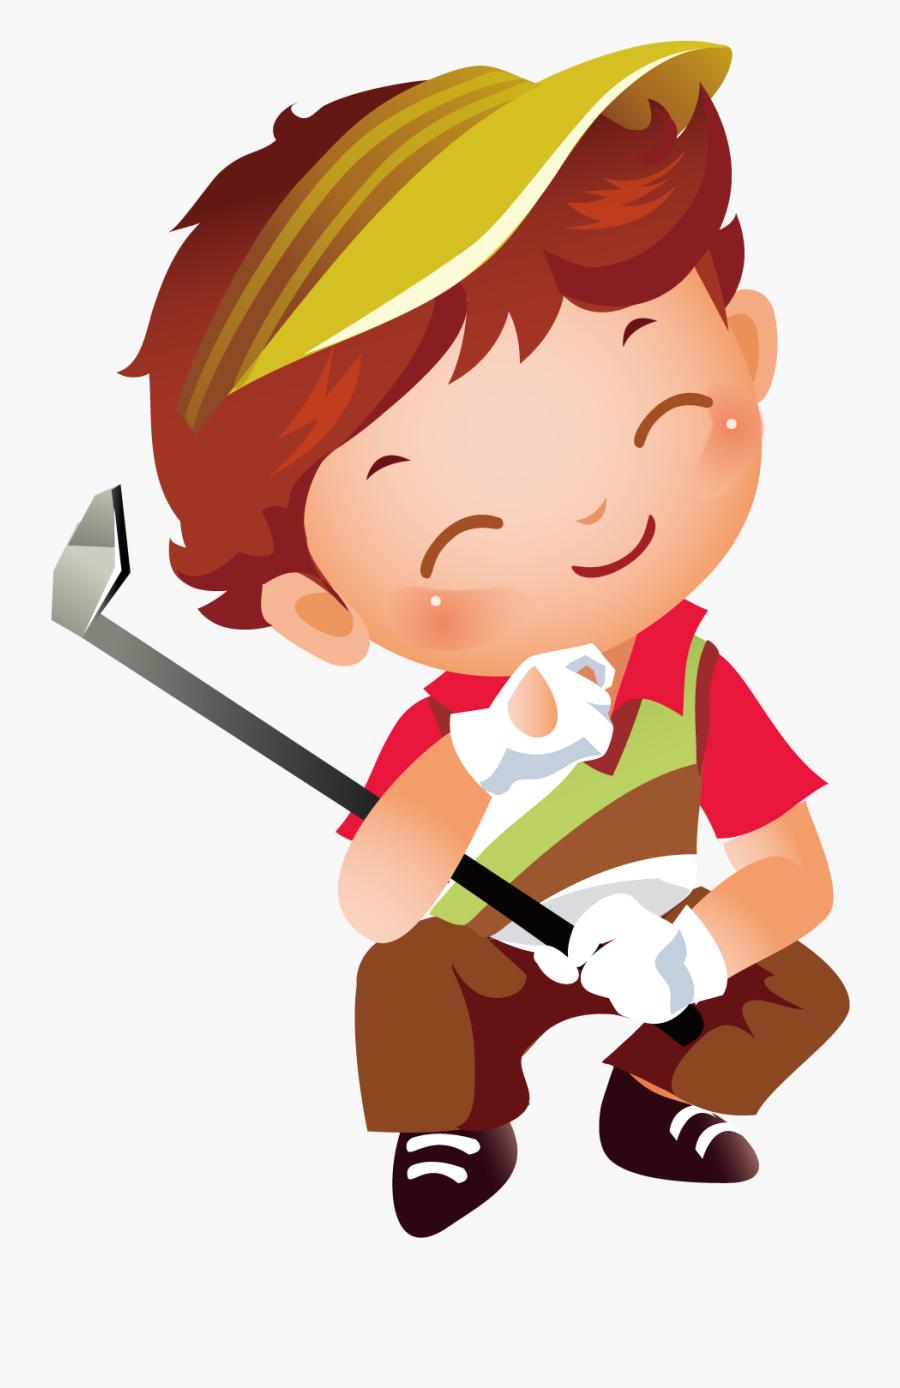 Transparent Golf Clipart Png - Golf Kids Vector, Transparent Clipart